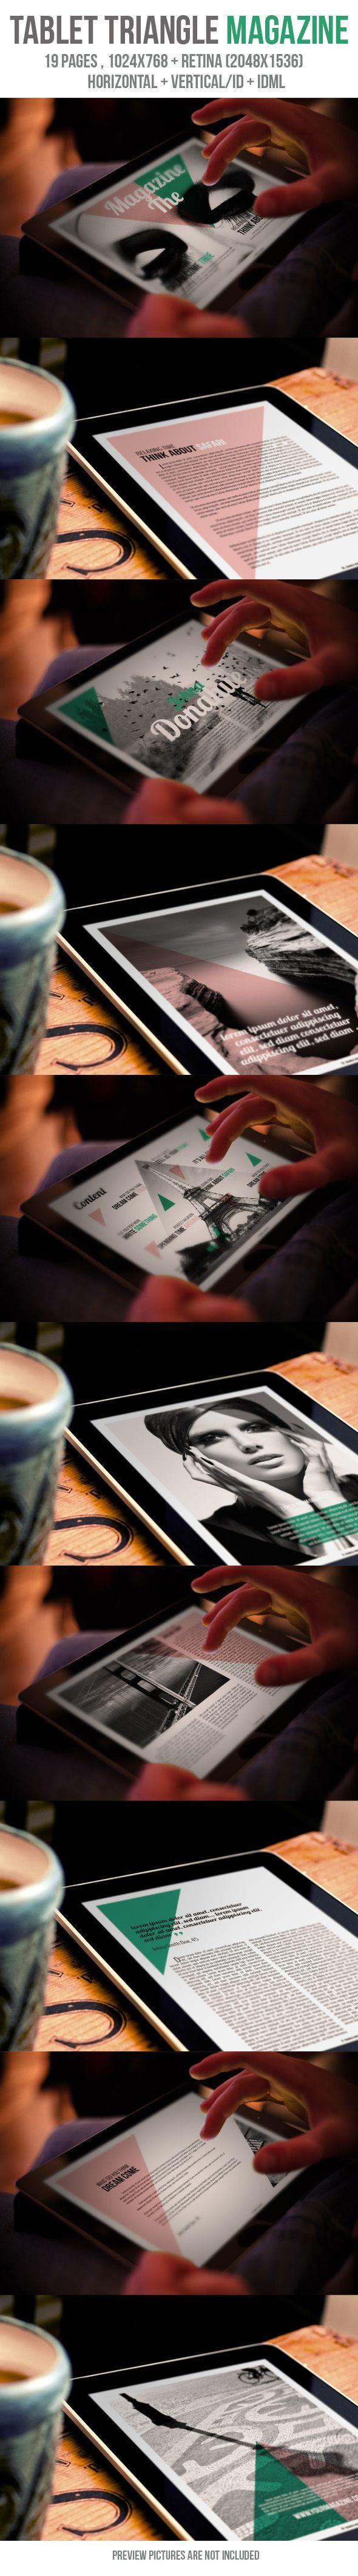 Tablet Triangle Magazine by crew55design, via Behance